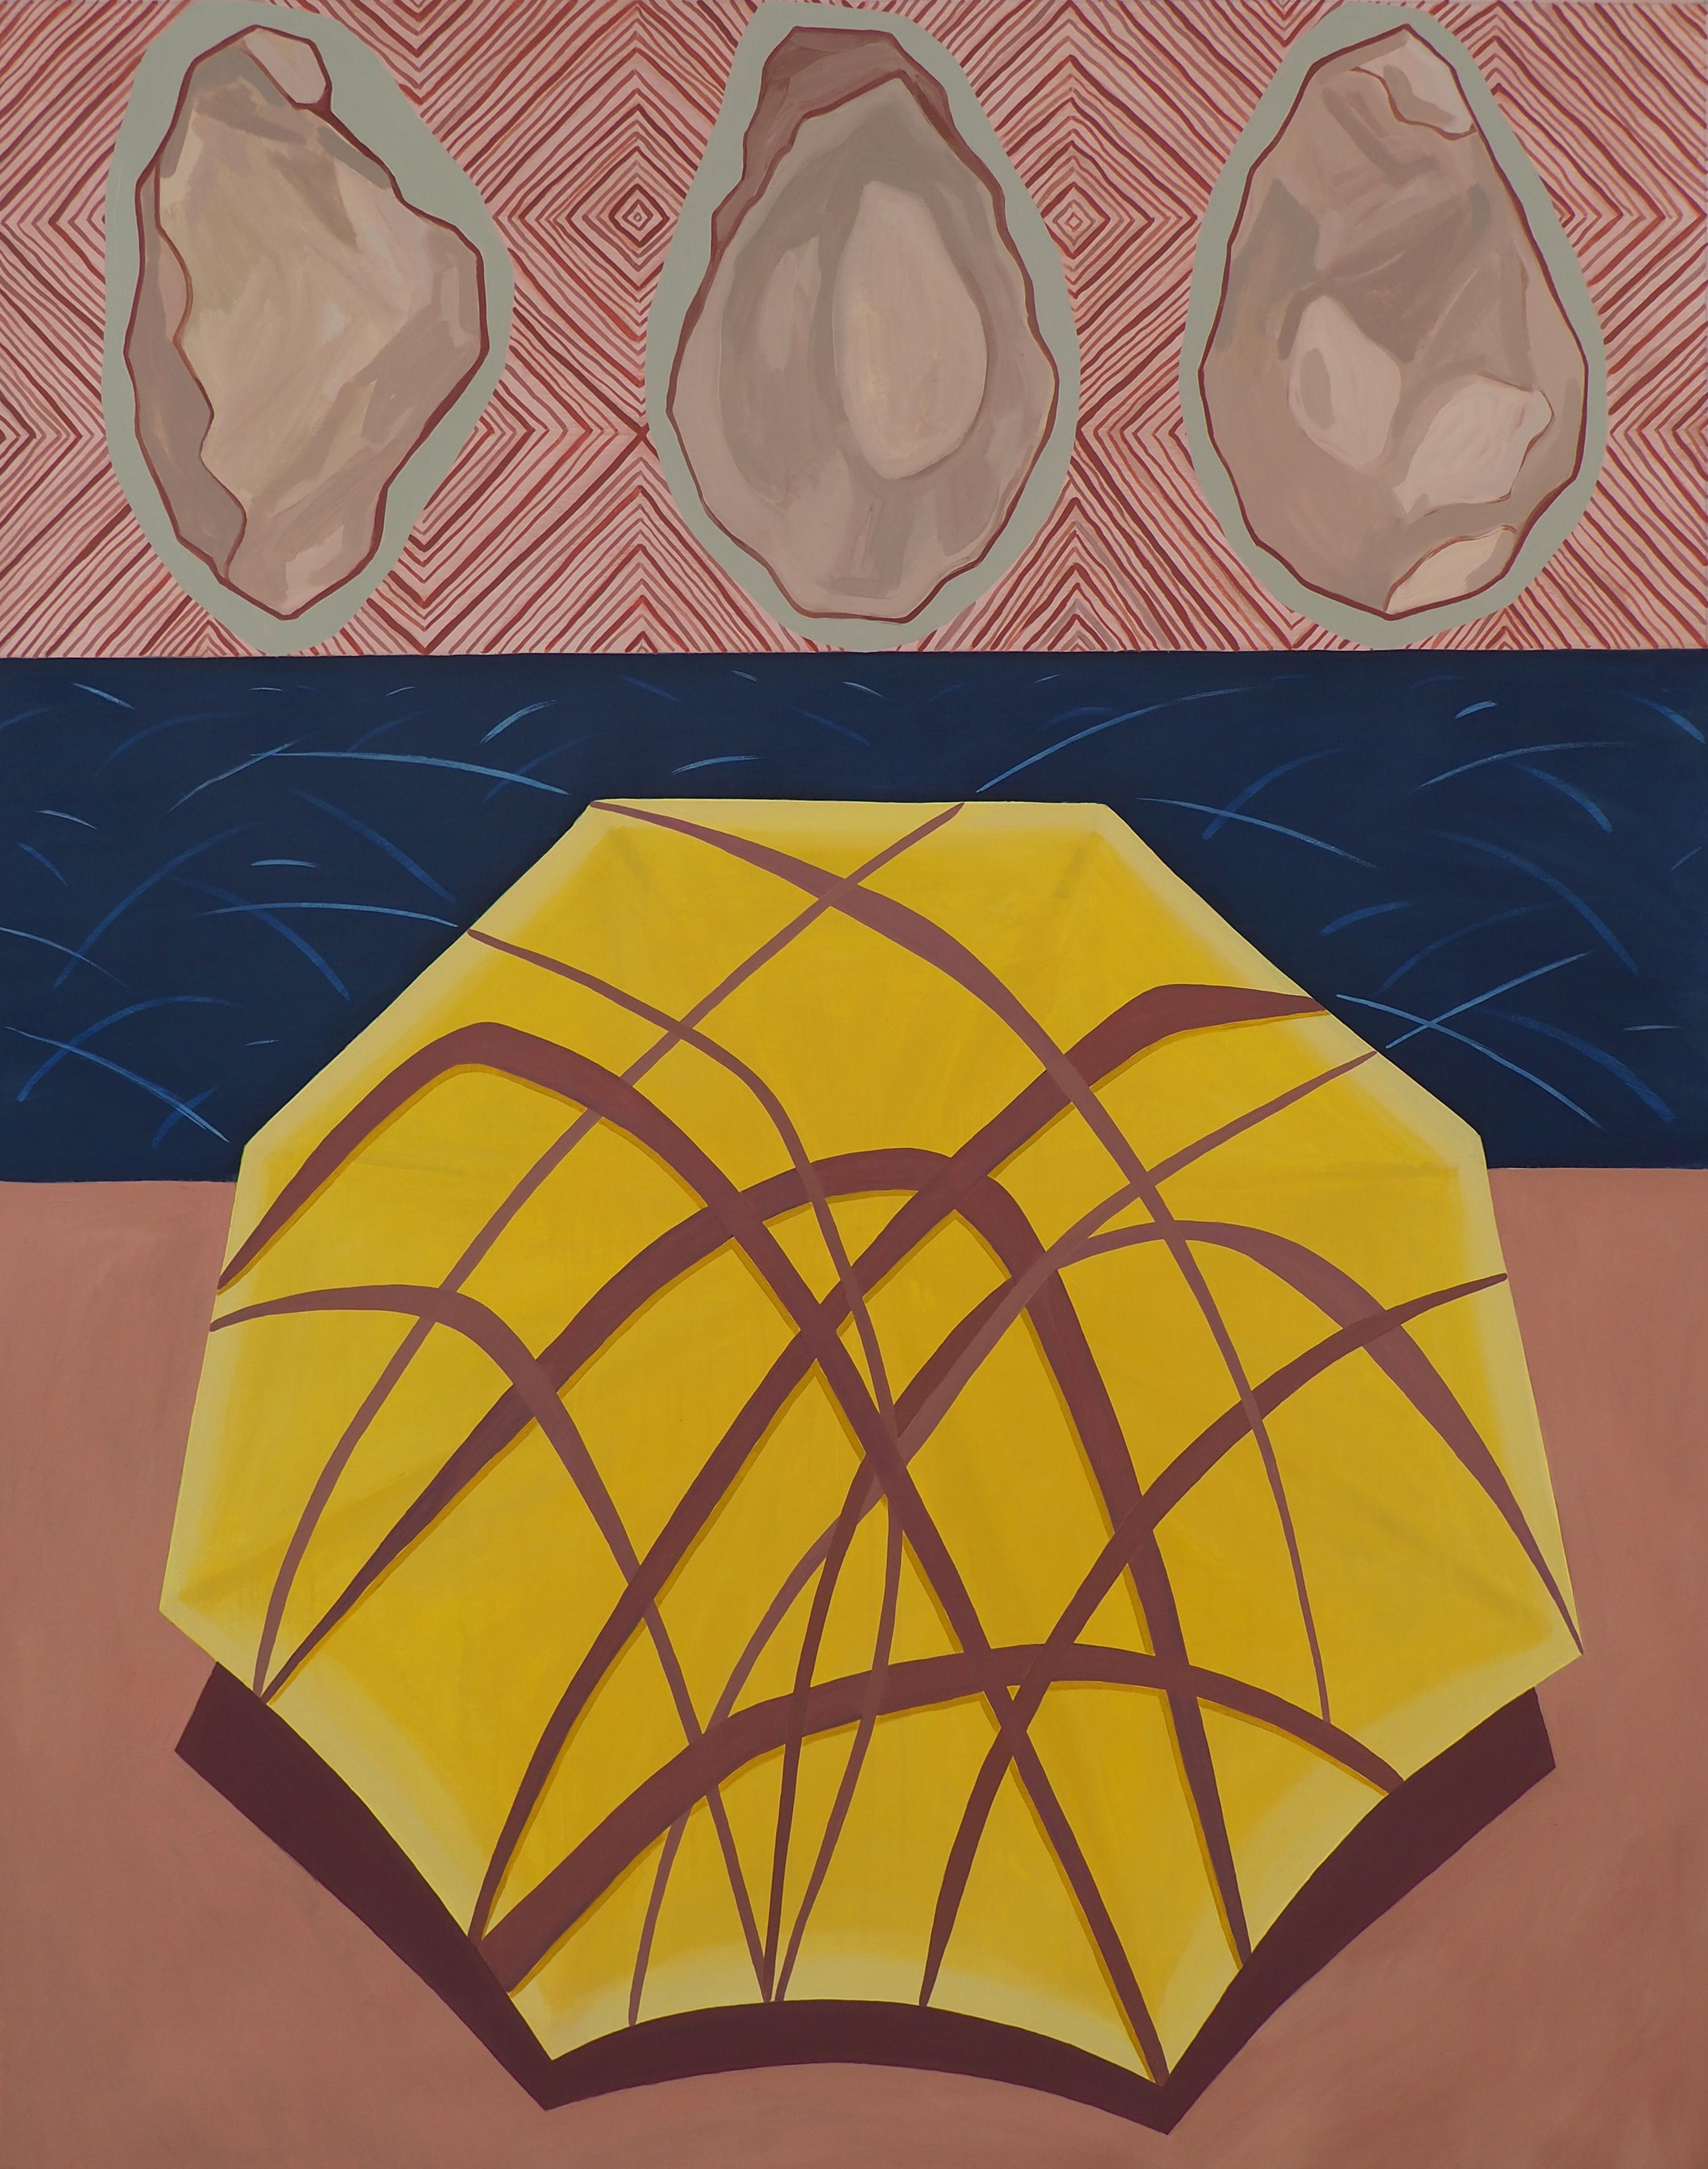 'The unseen horizon', Oil on Canvas, 150x120cm